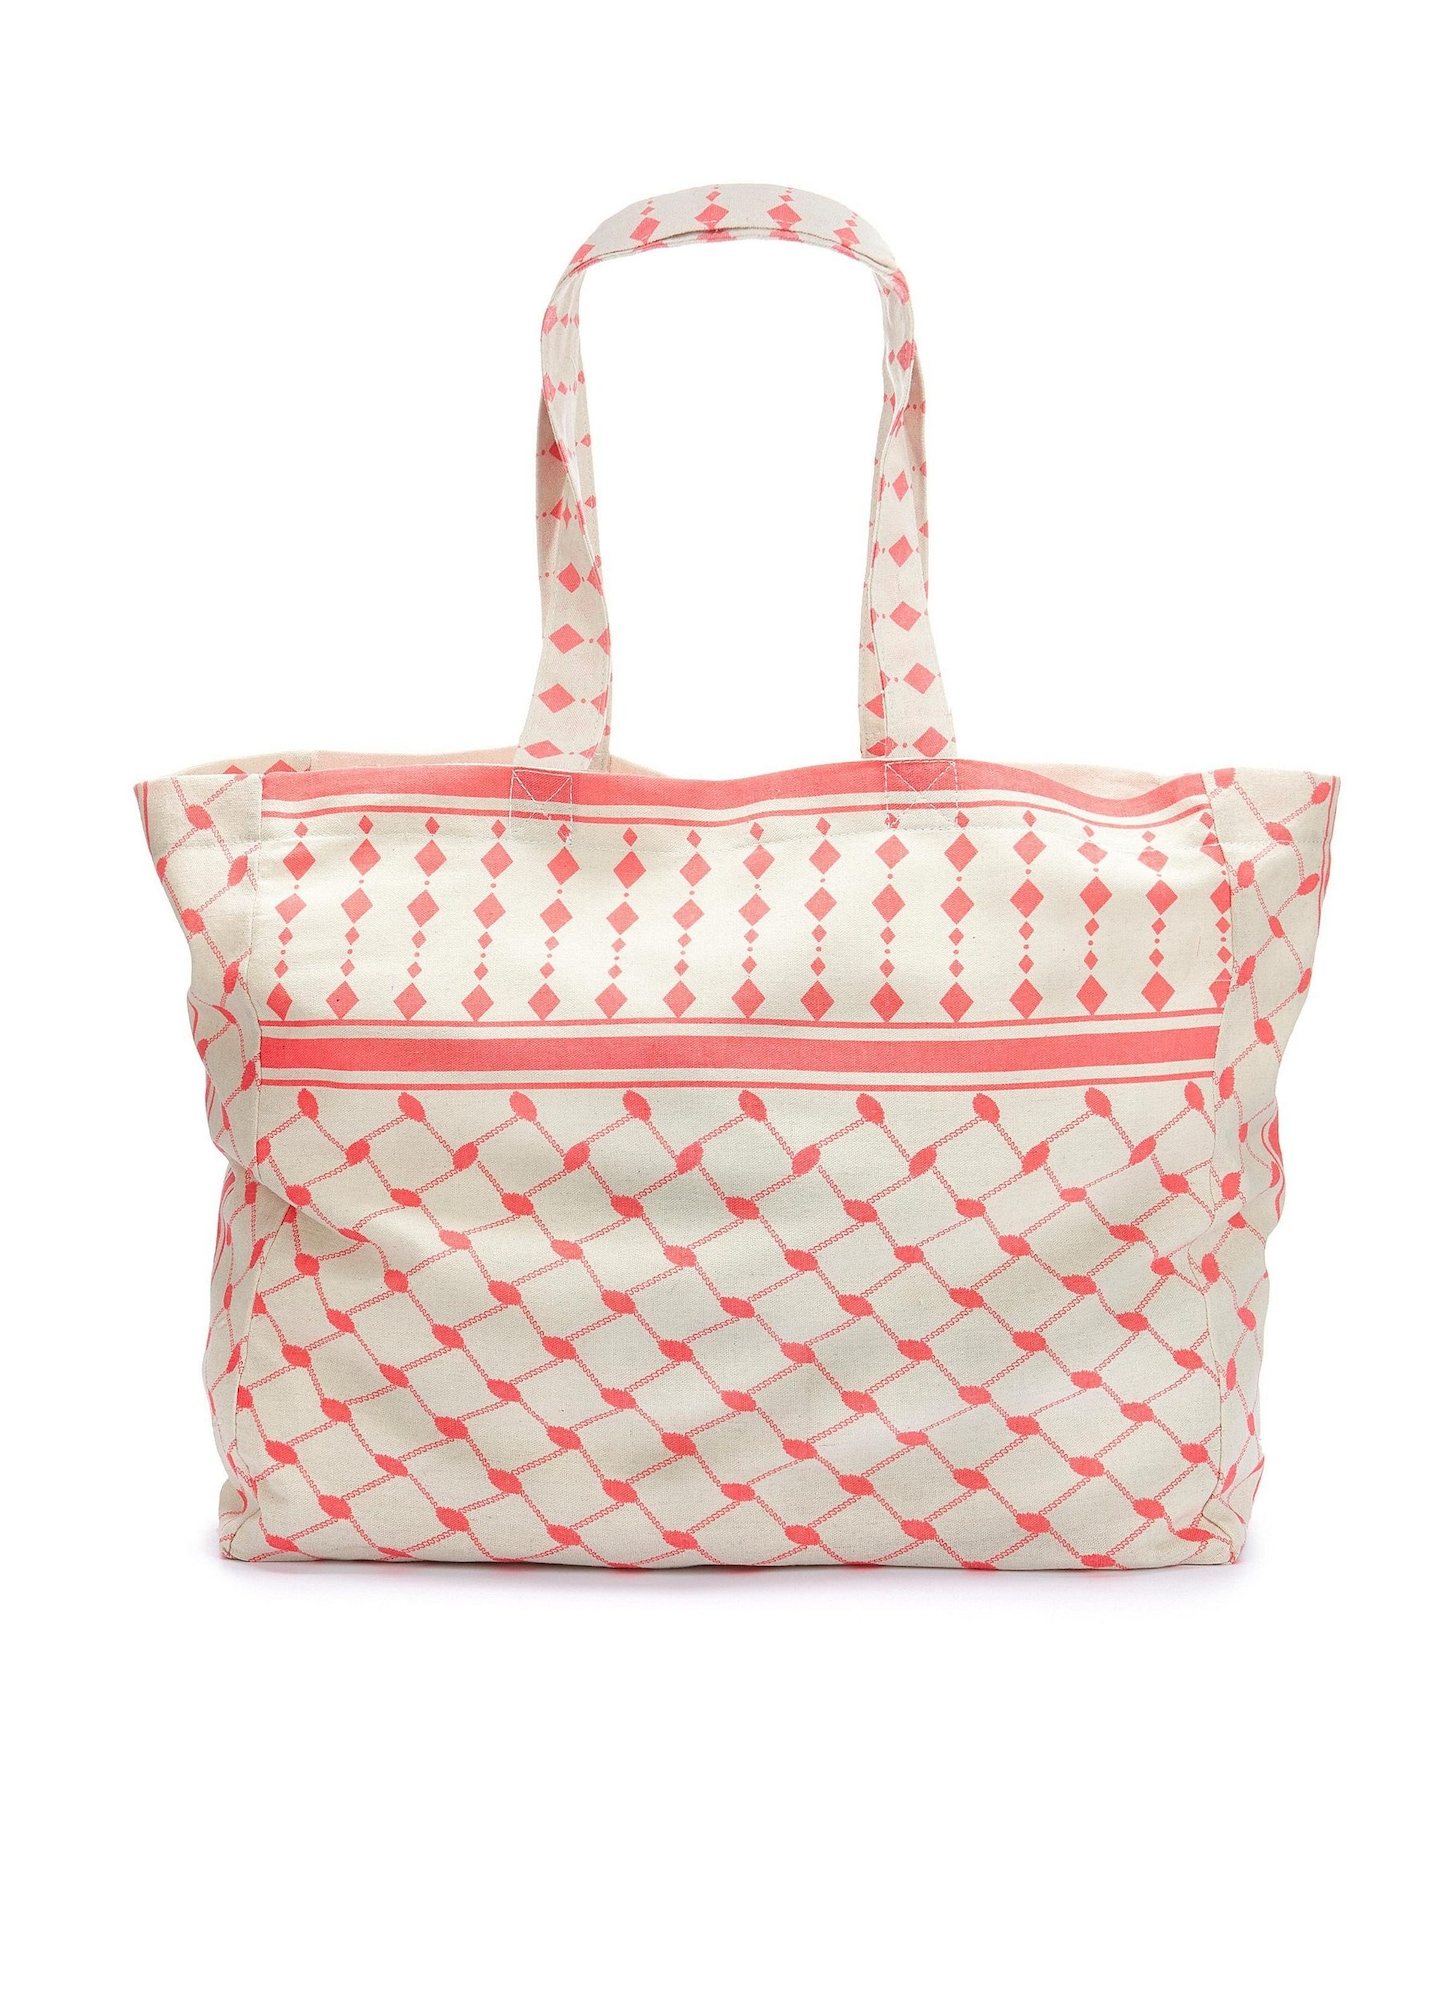 Strandtasche | Taschen > Handtaschen > Strandtaschen | Lascana